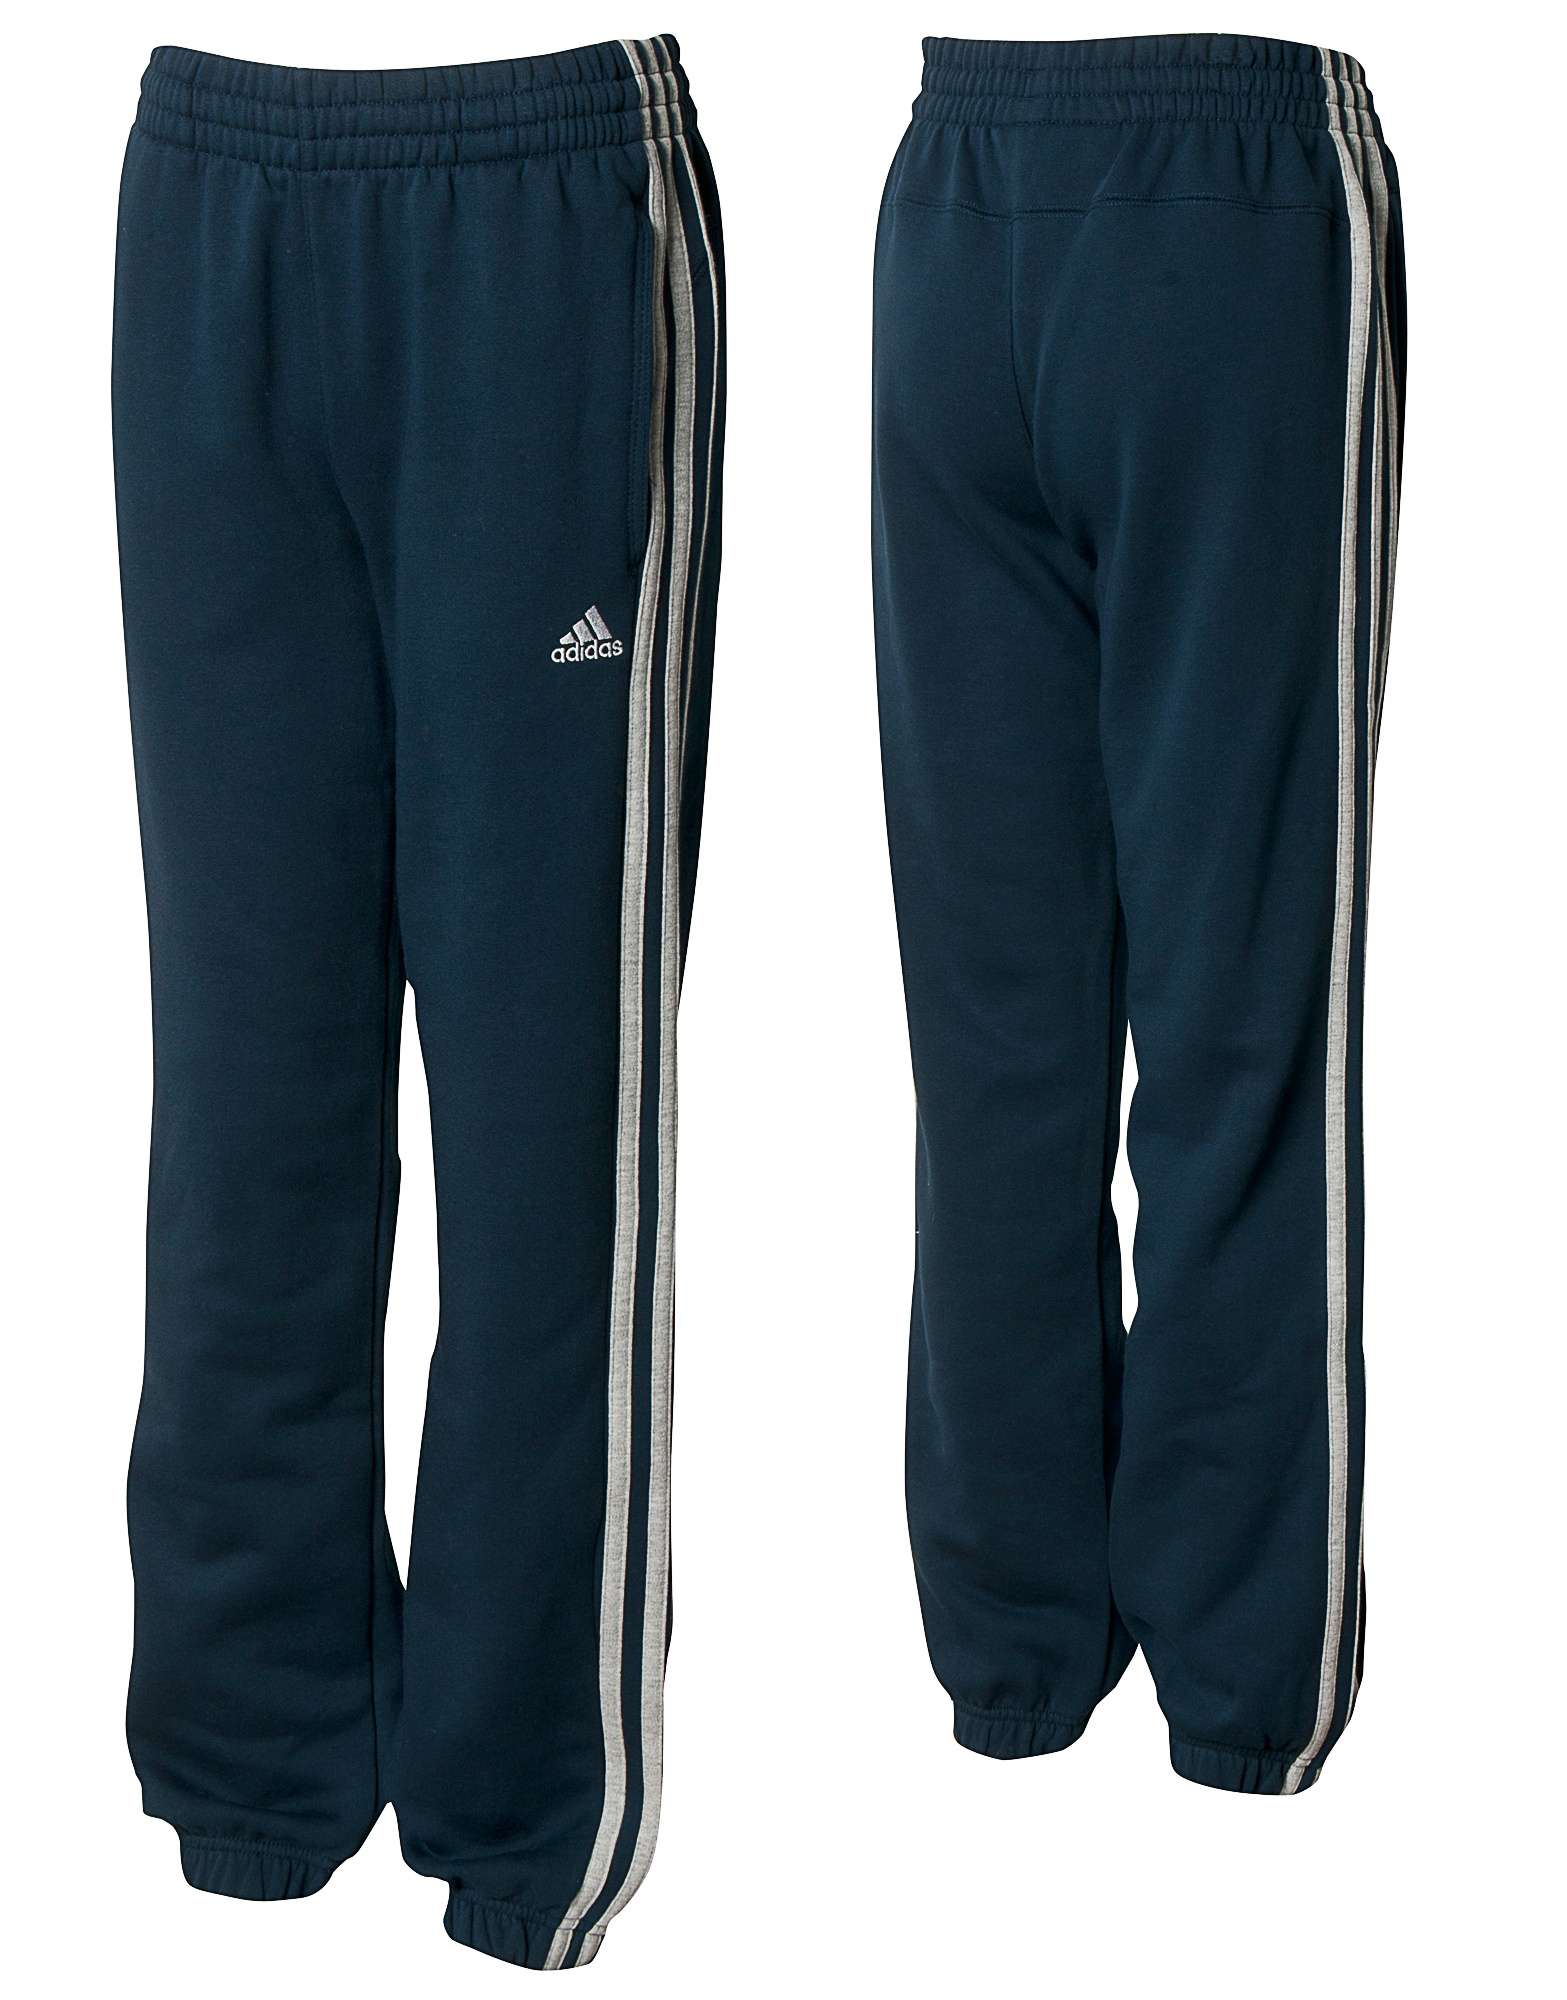 adidas Essentials Pants Juniors